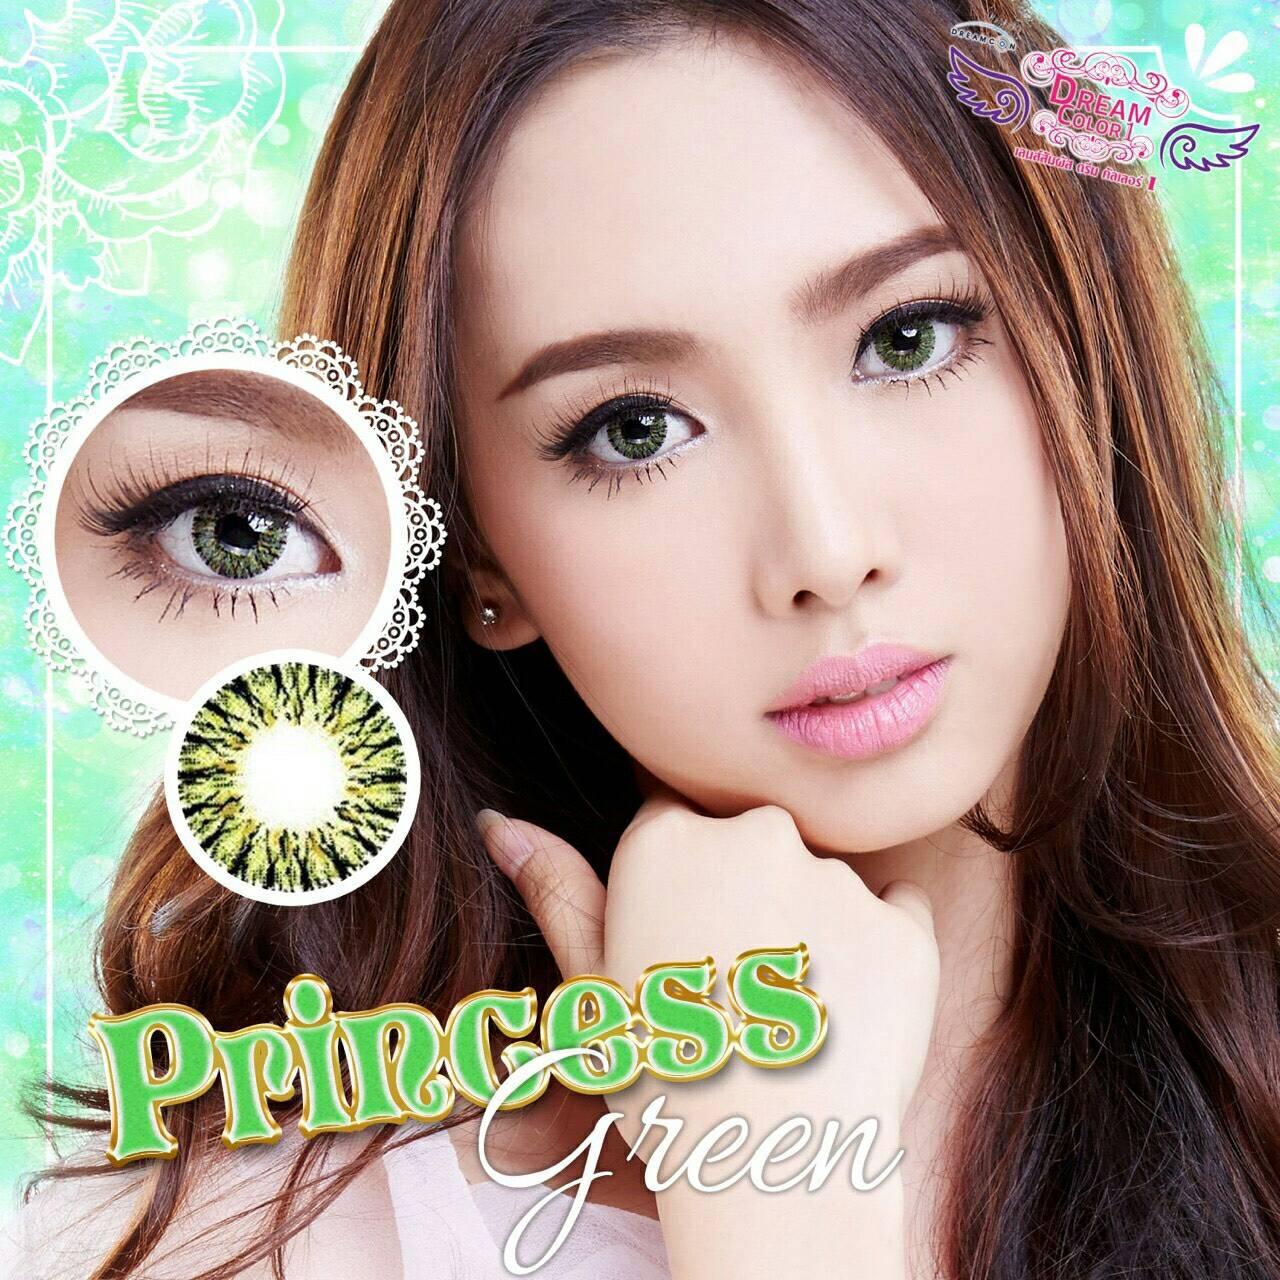 Princess Green Dreamcolor1เลนส์นิ่มใส่สบาย คอนแทคเลนส์ ขายส่งคอนแทคเลนส์ ขายส่งBigeye Bigeyeเกาหลี